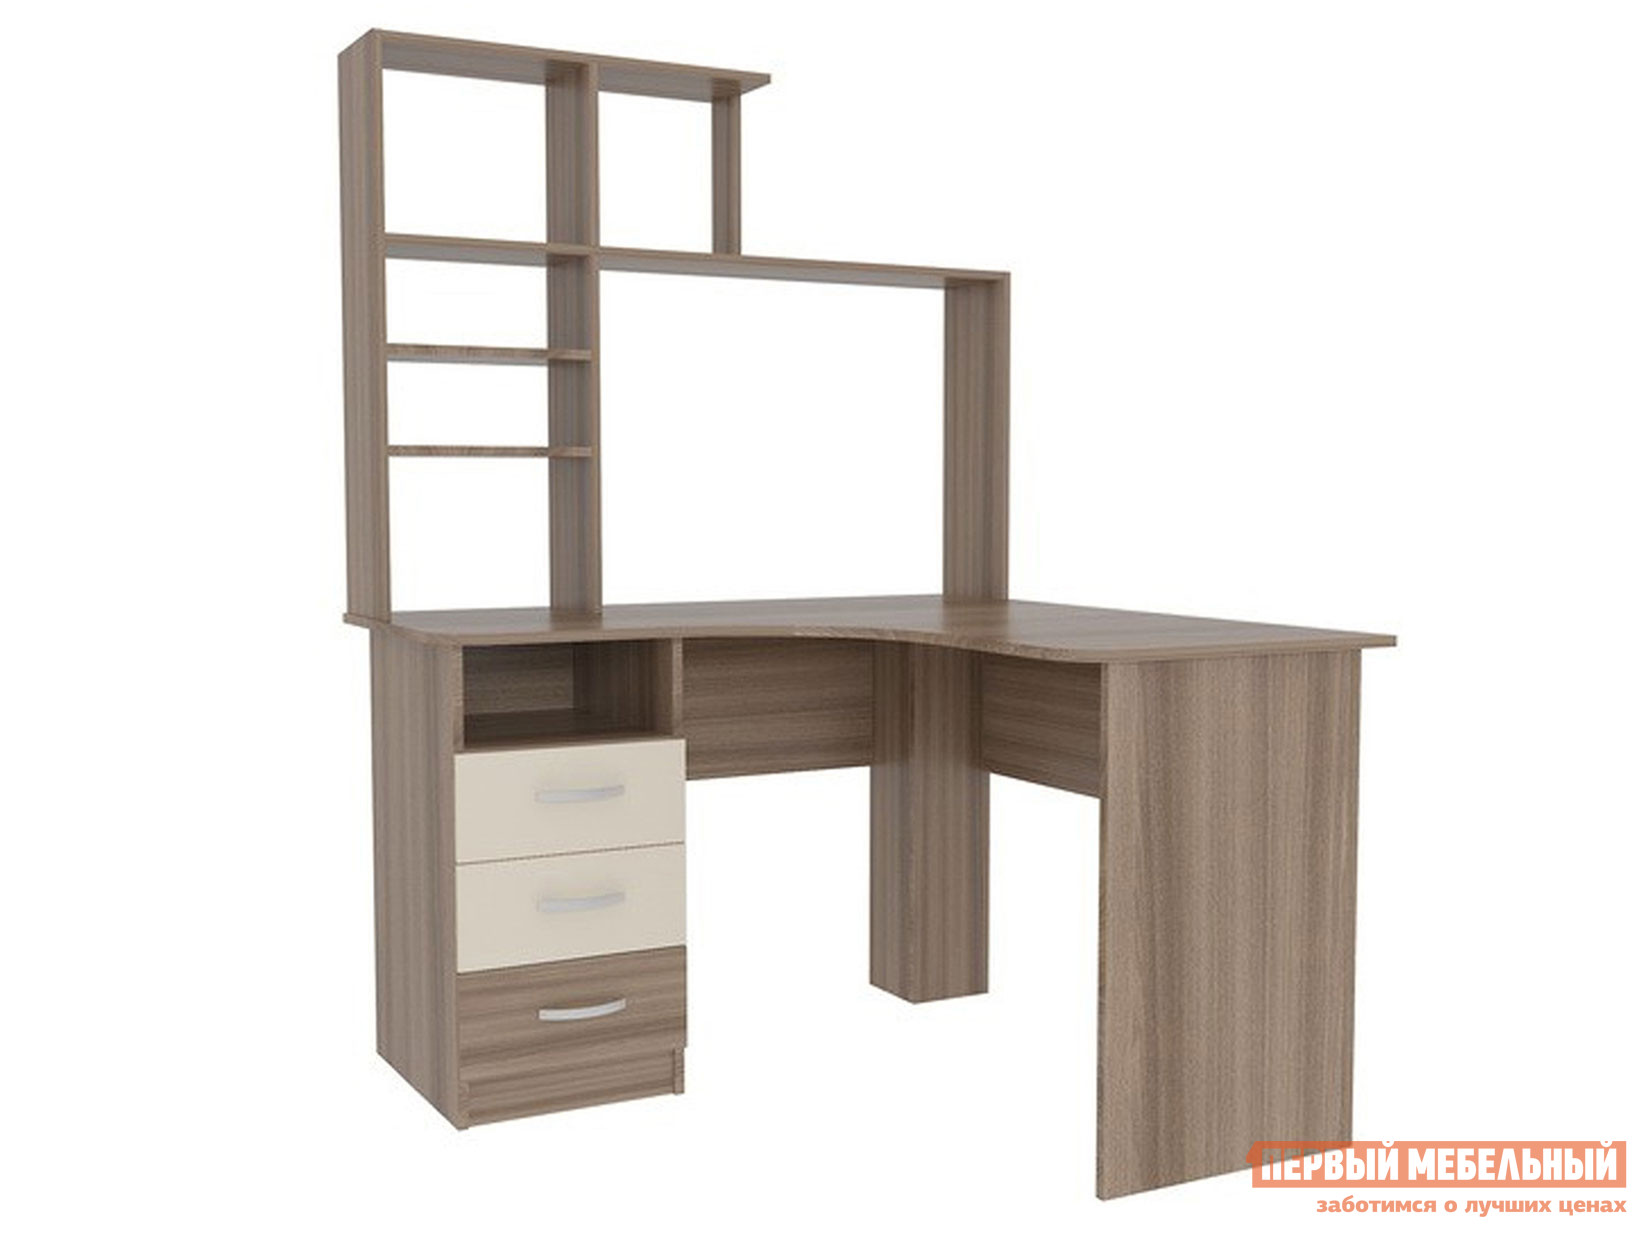 Фото - Компьютерный стол Мебельсон SK03P2.3 + PK02S2.3 компьютерный стол детский мебельсон акварель стол мма 005